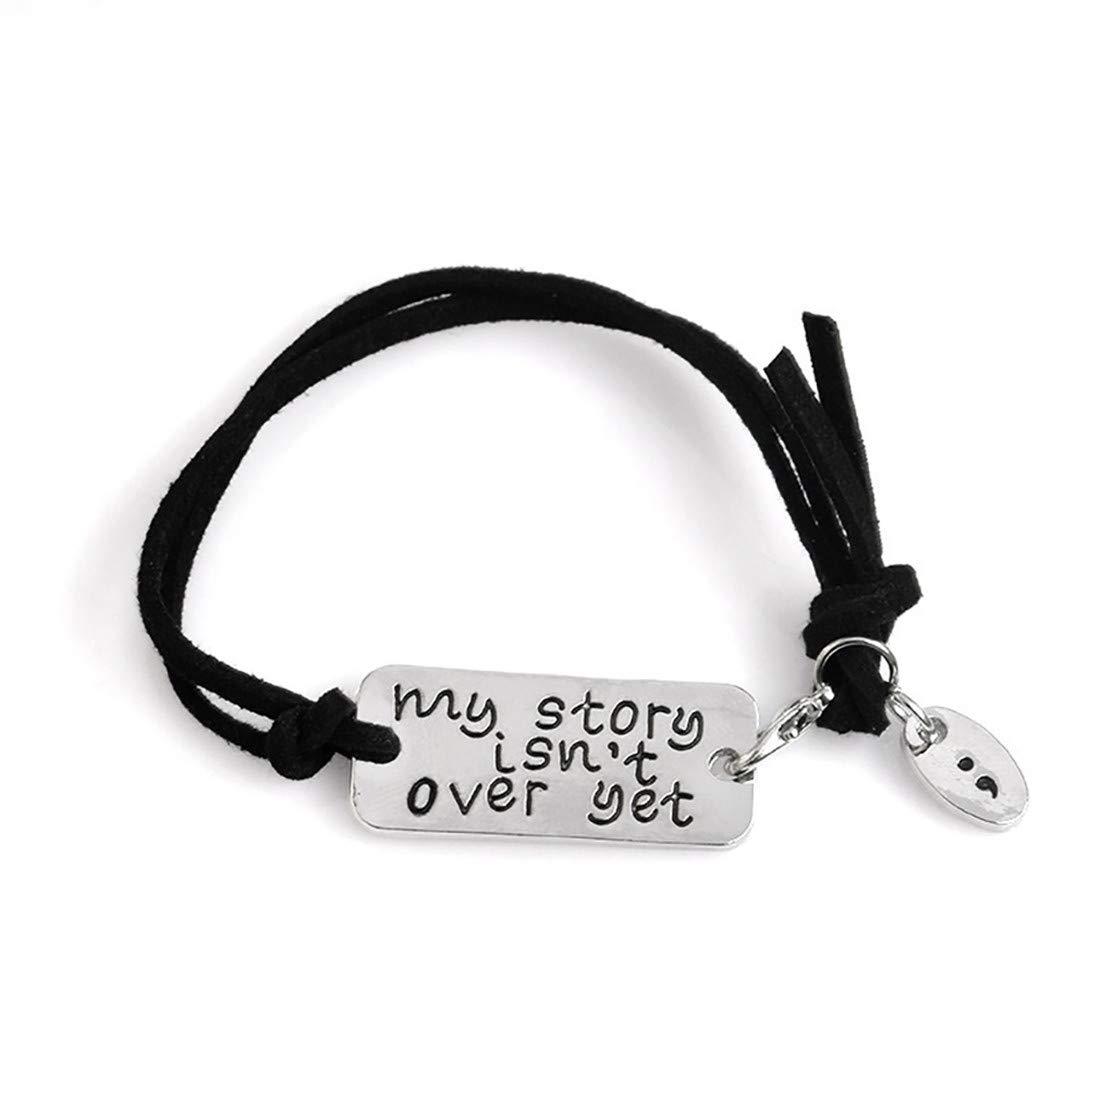 VWH My Story Isn't Over Yet Letters Bracelet Adjustable Suede Leather Wrap Bracelet